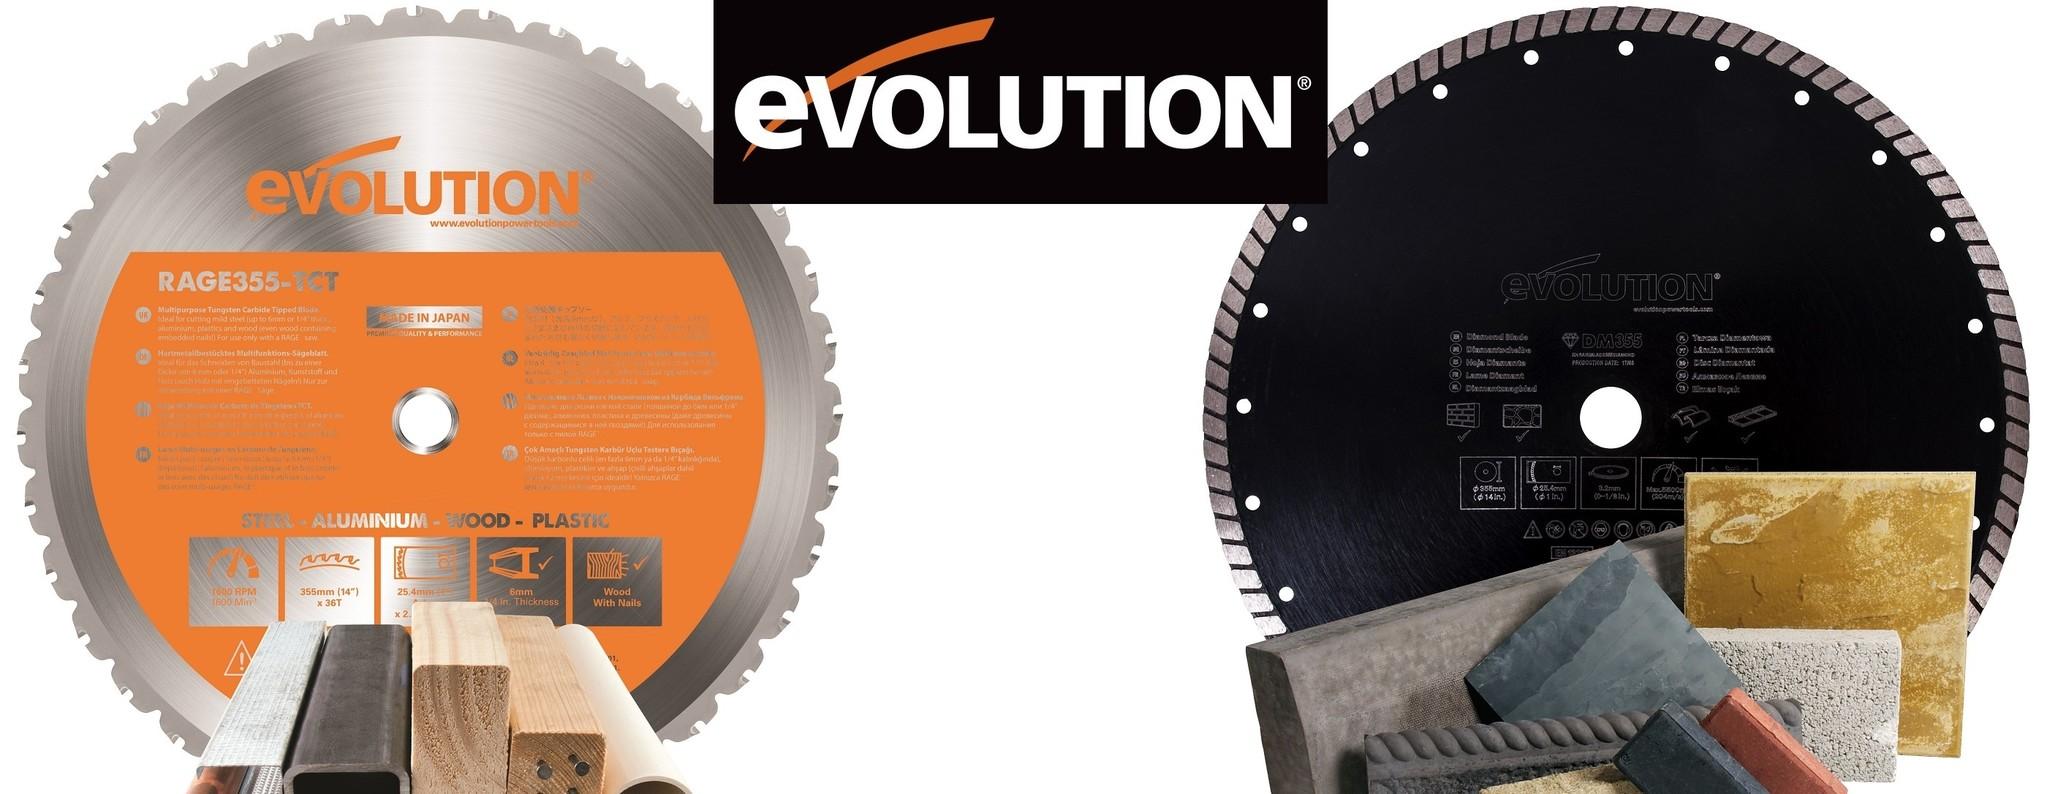 Evolution build